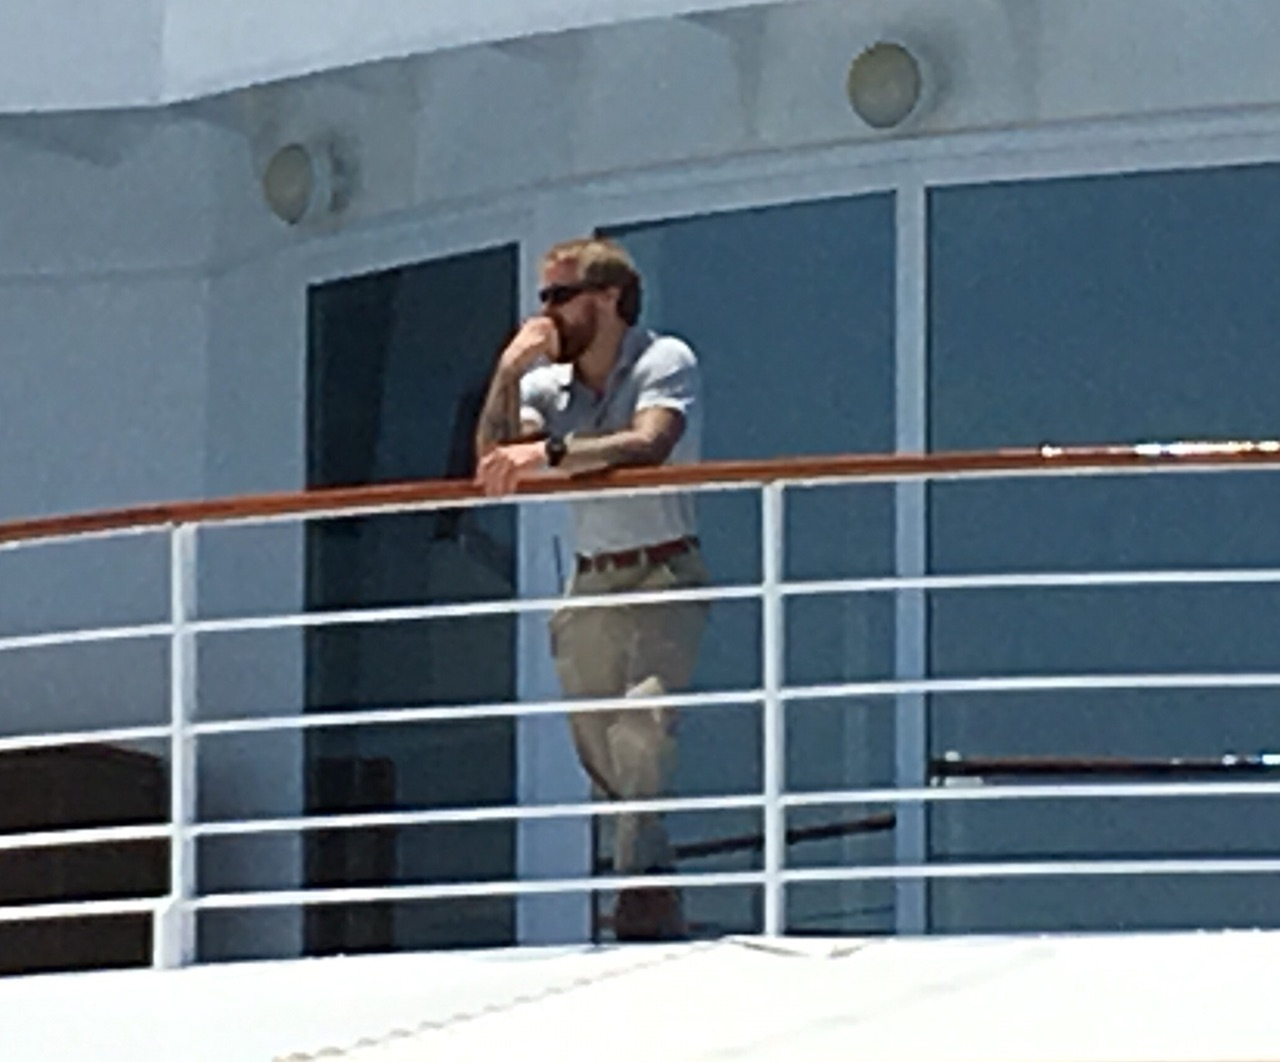 Actual pirate protecter